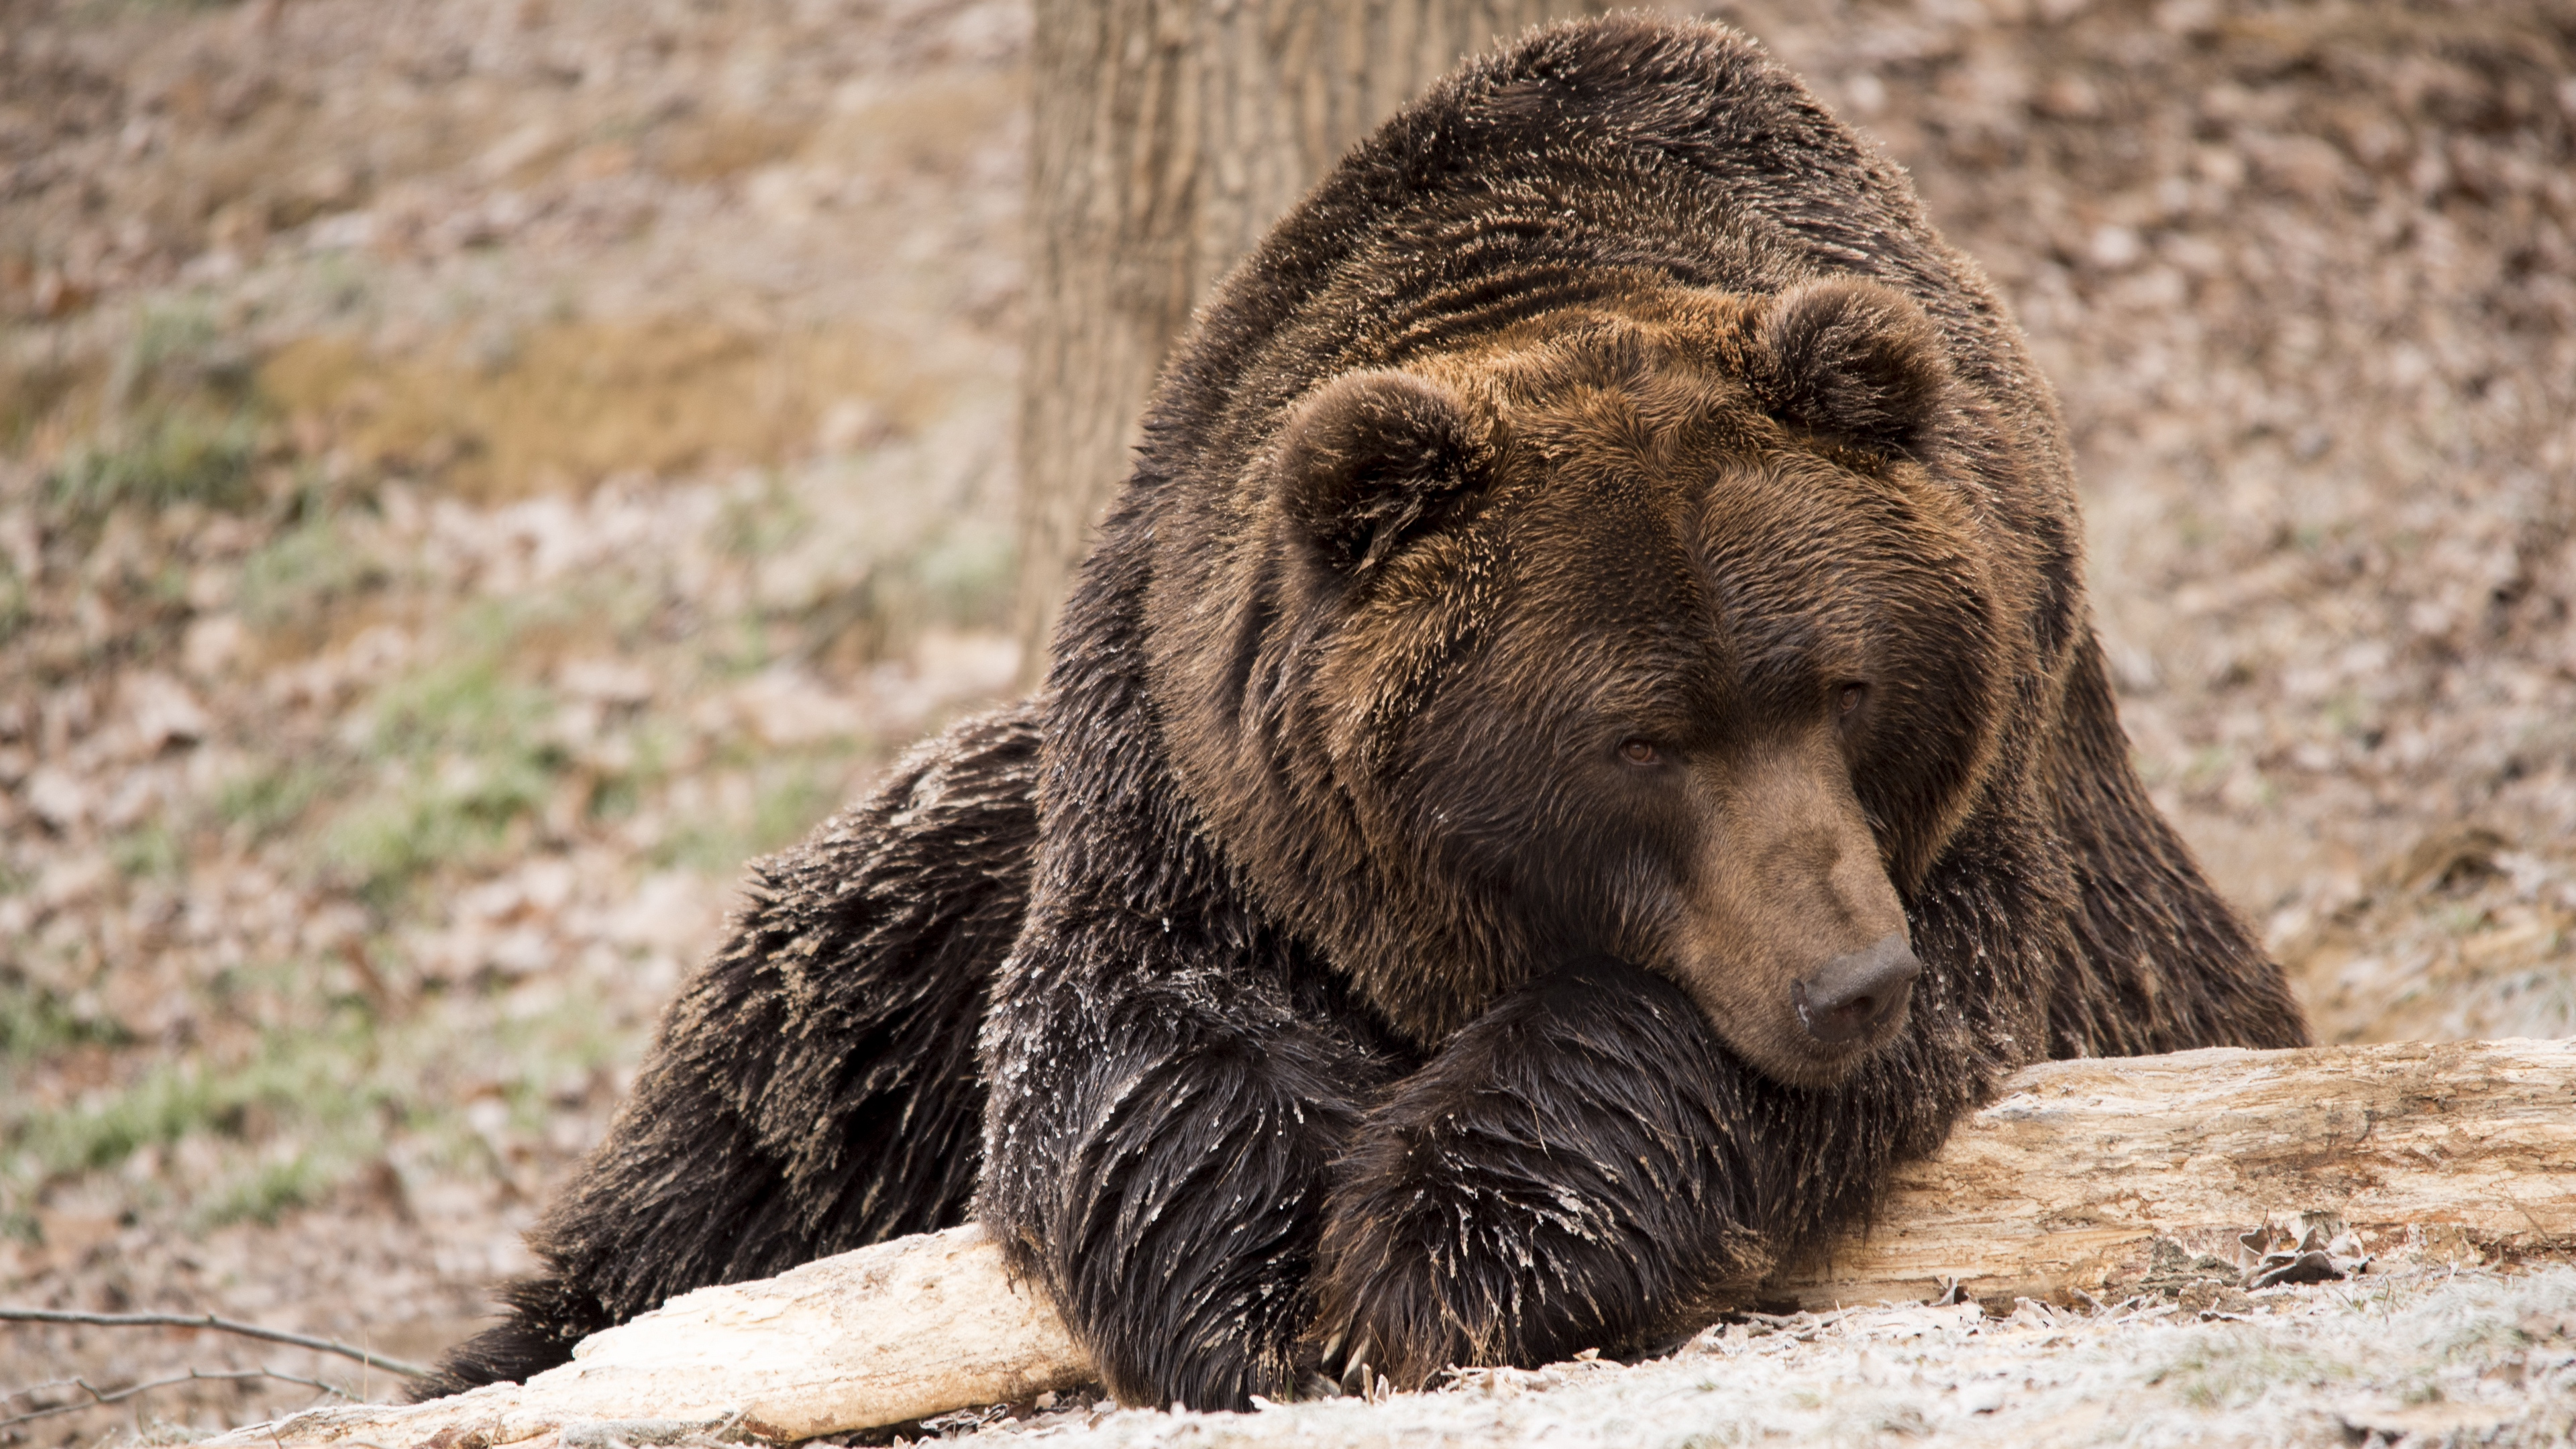 brown bear bear lies 4k 1542242971 - brown bear, bear, lies 4k - lies, brown bear, Bear